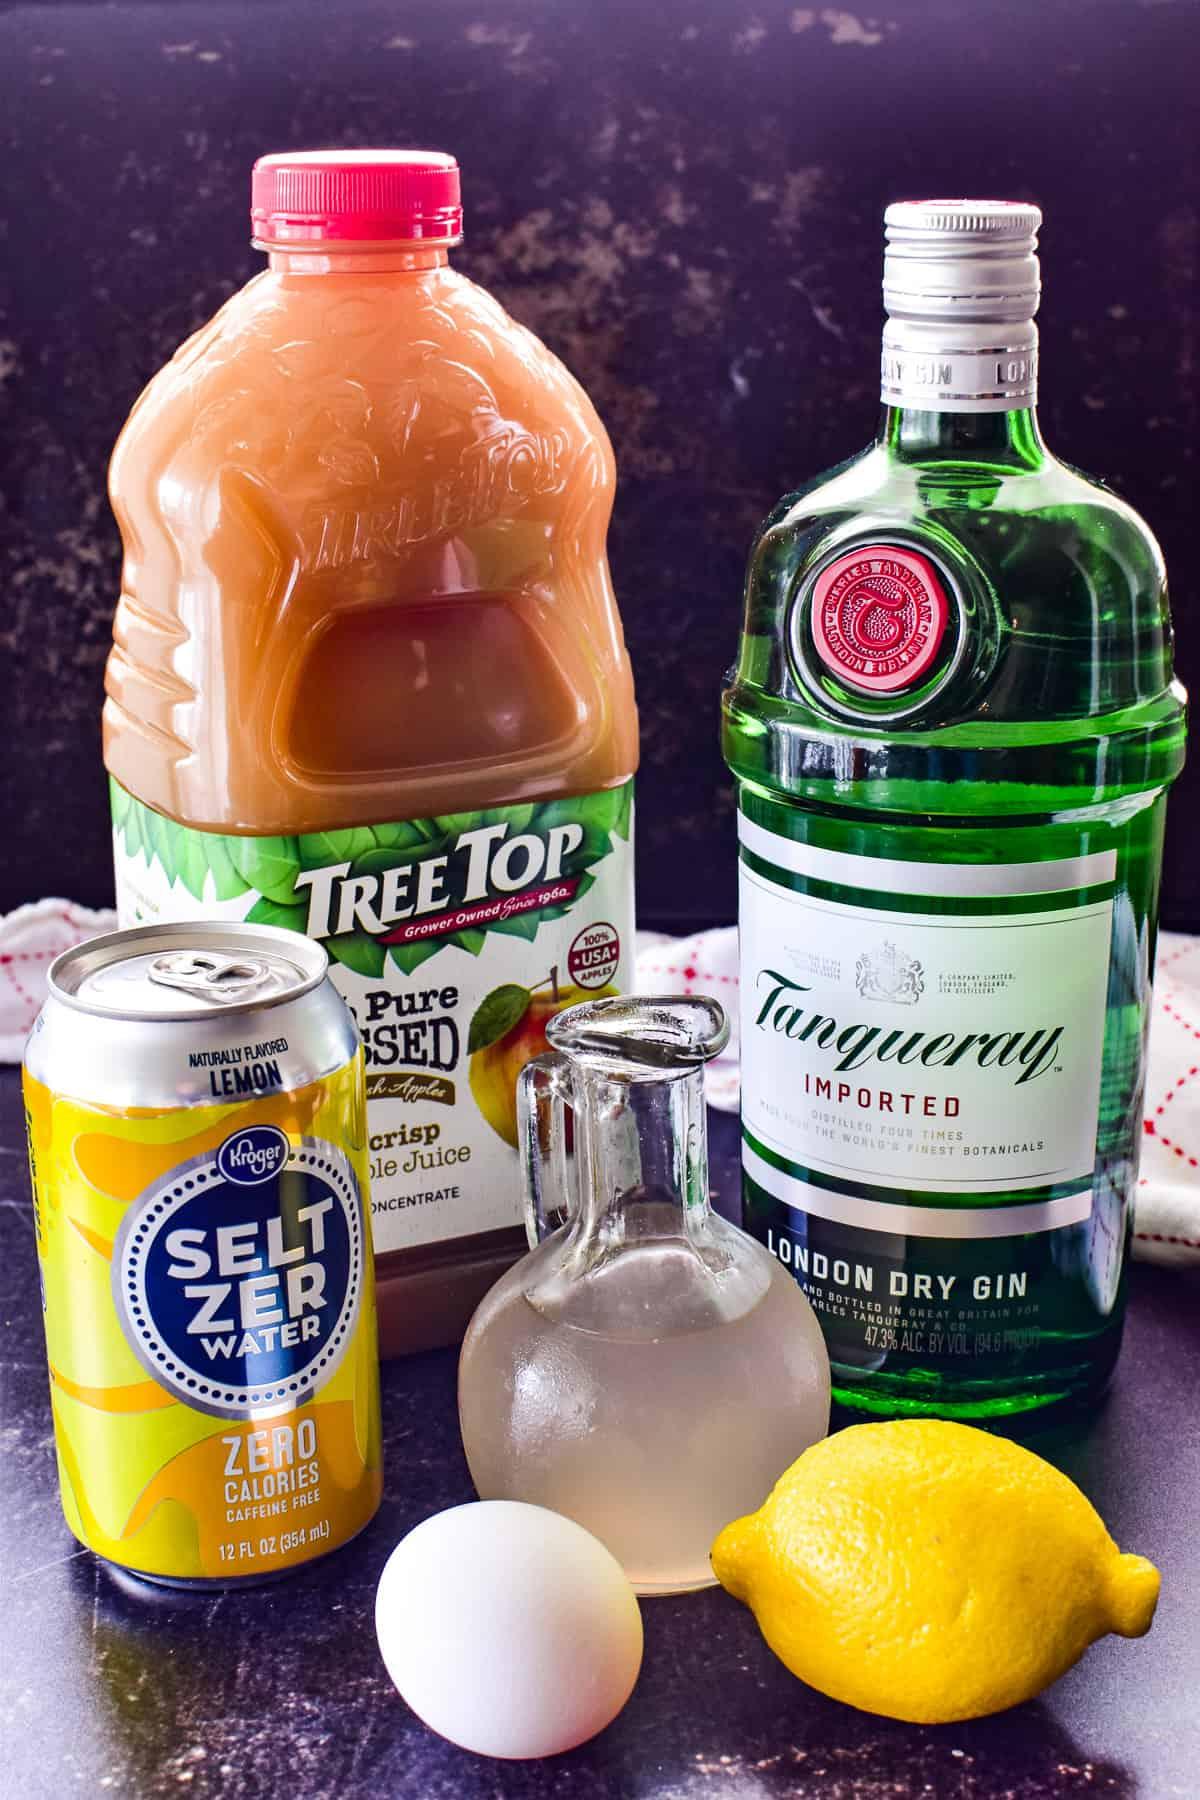 Apple Gin Fizz ingredients